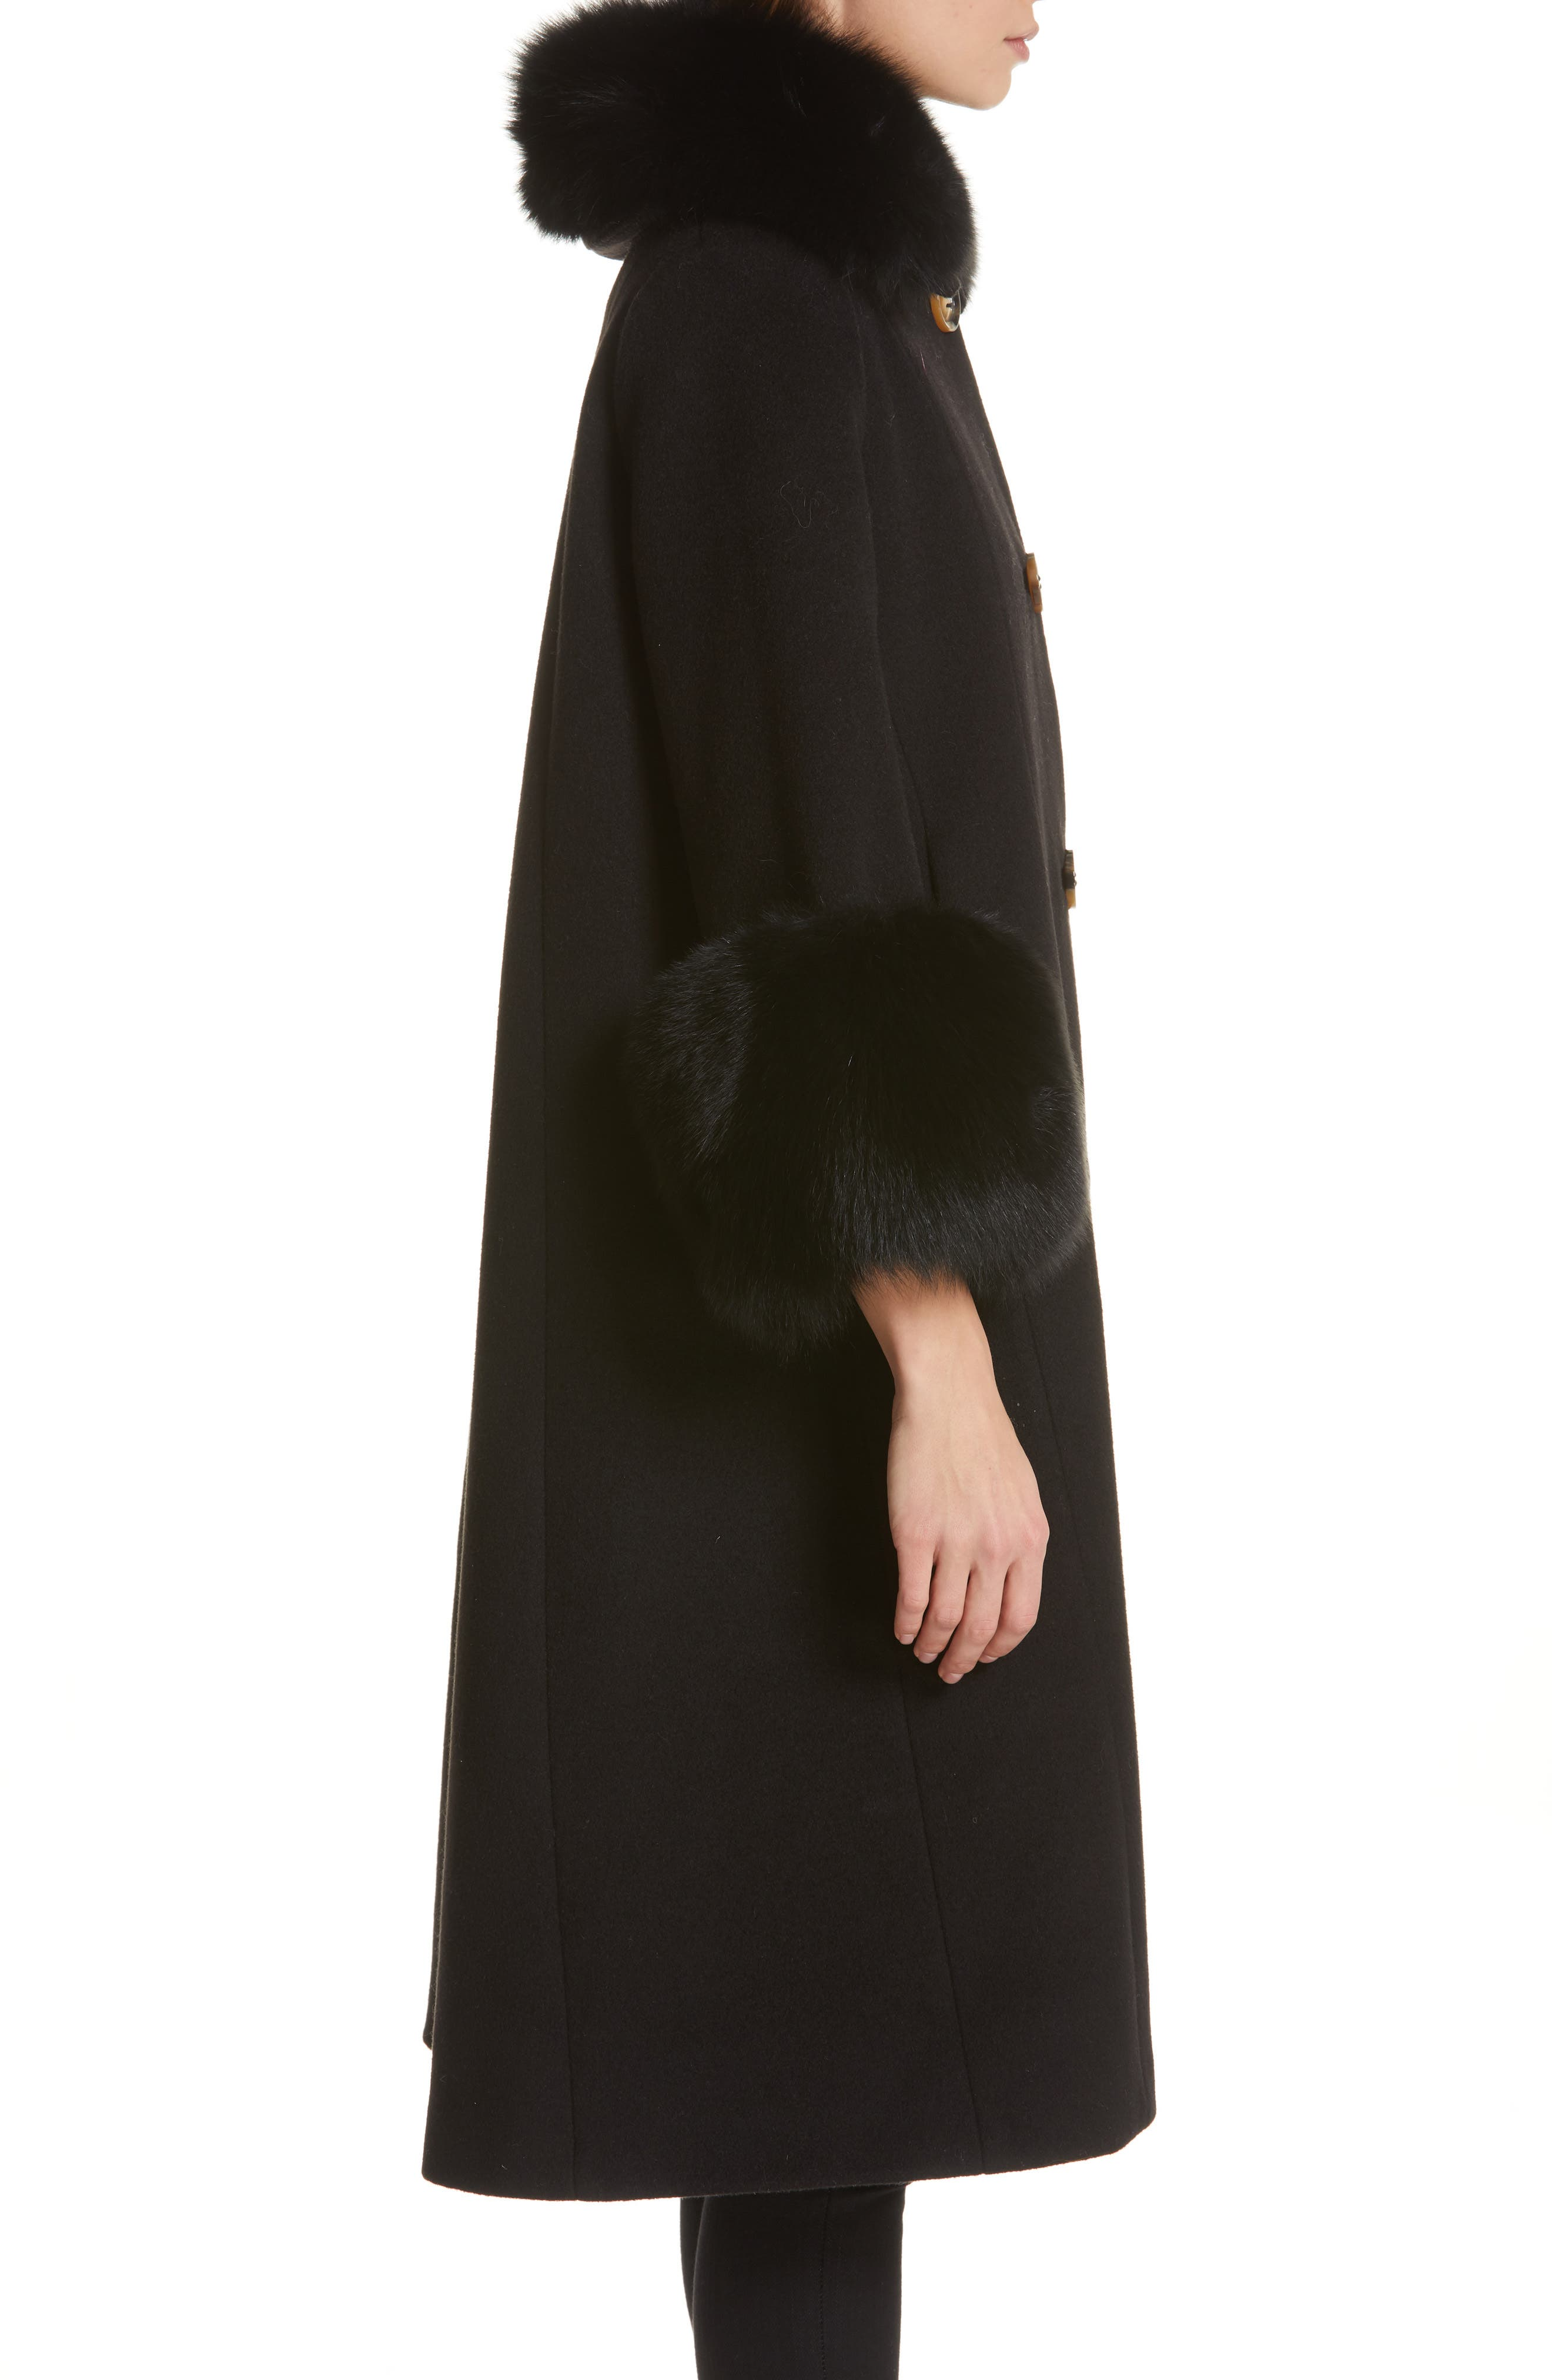 SAKS POTTS,                             Yvonne Wool Coat with Genuine Fox Fur Trim,                             Alternate thumbnail 3, color,                             001